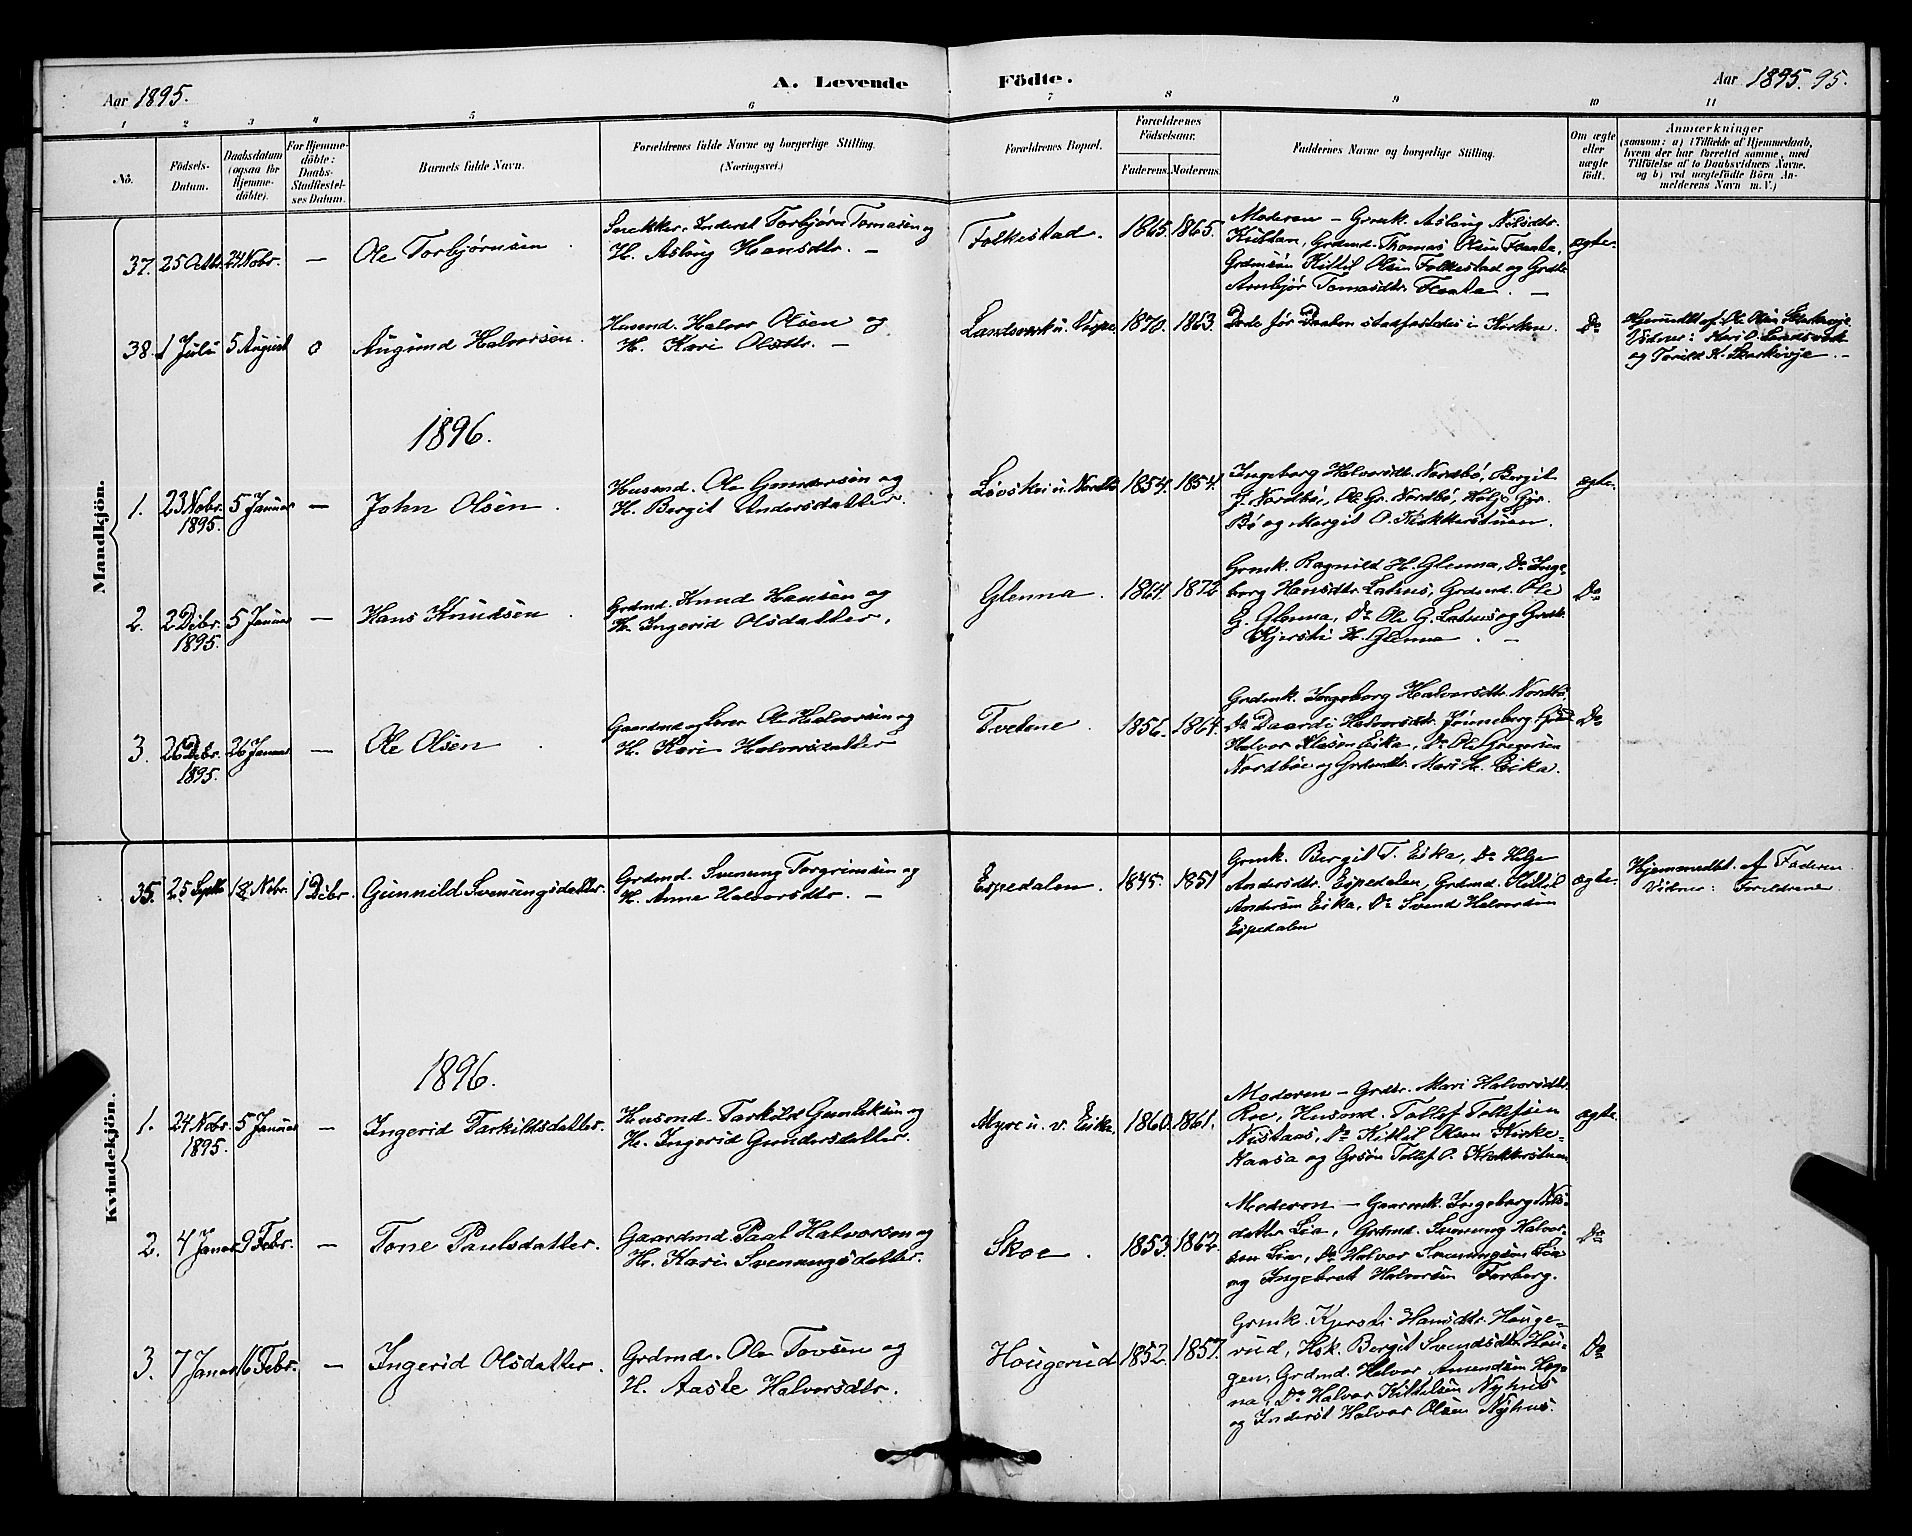 SAKO, Bø kirkebøker, G/Ga/L0005: Klokkerbok nr. 5, 1883-1897, s. 95